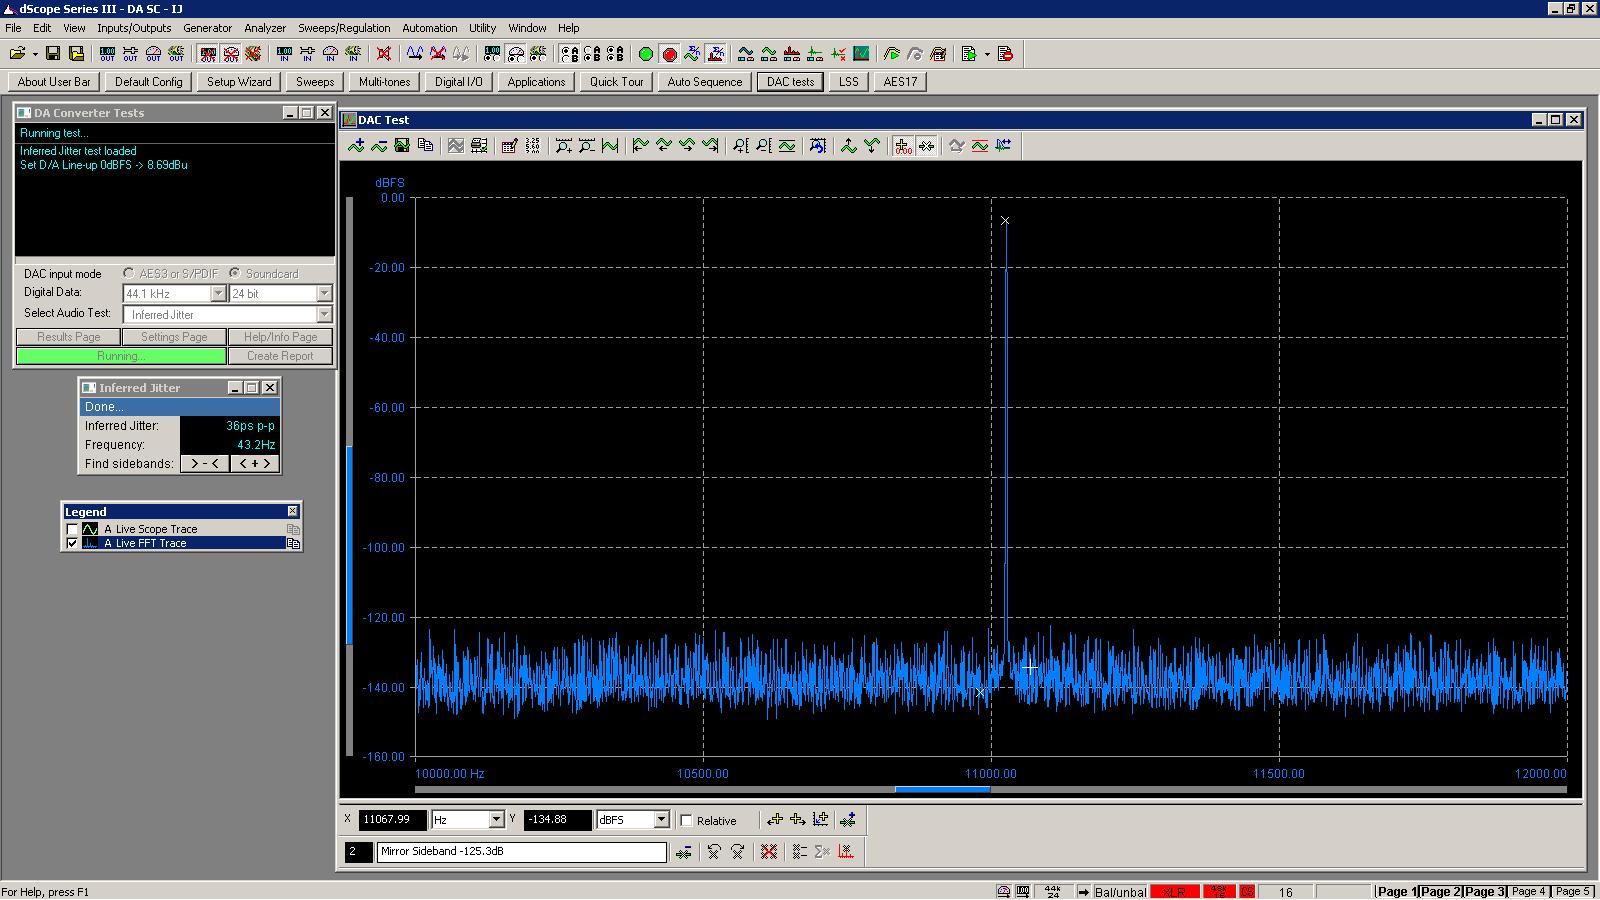 20160812 Modi MB inferred jitter - 2 KHz BW - u12 - toslink.png